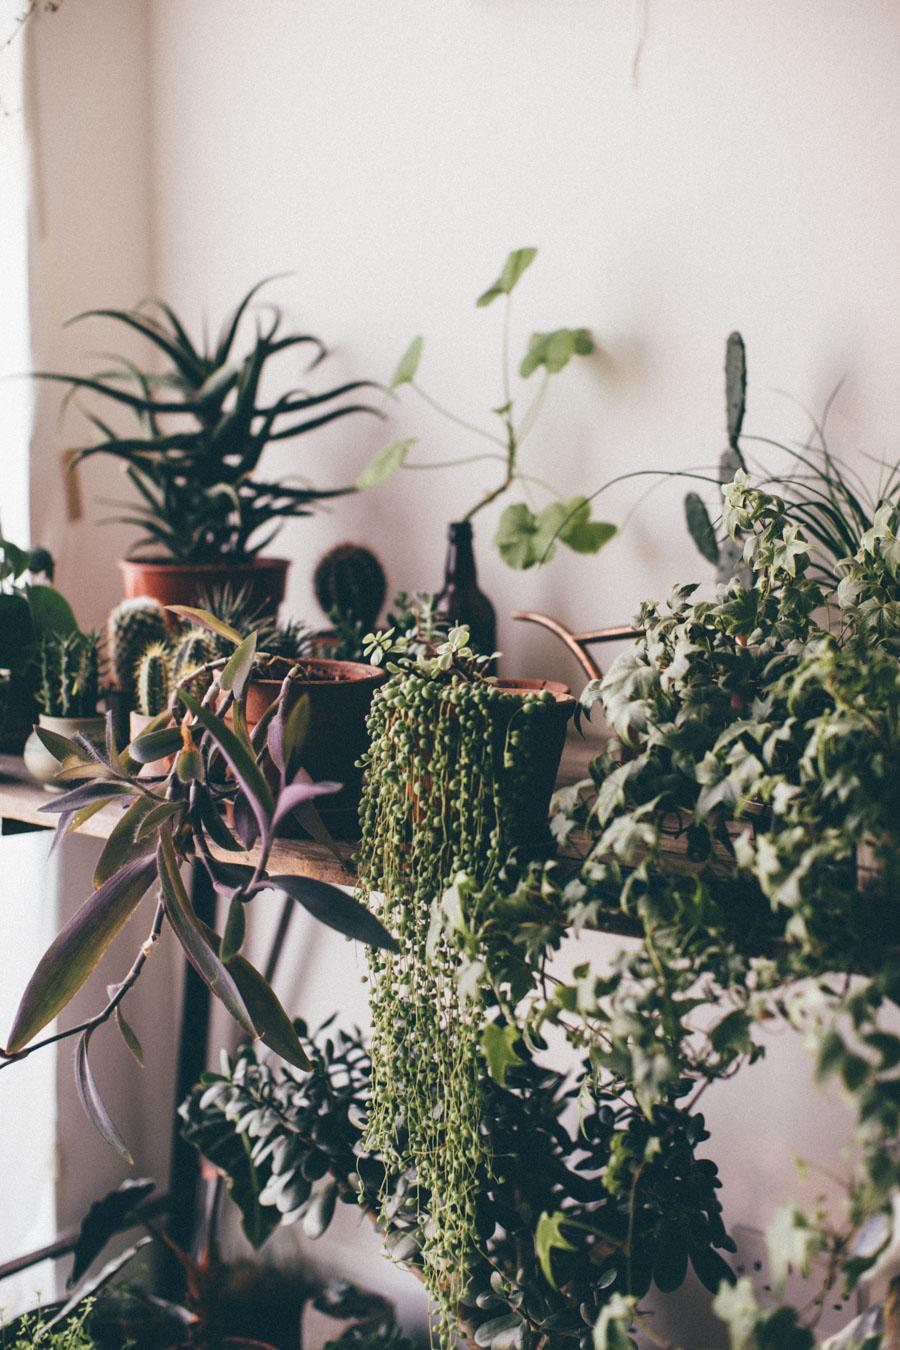 Office gardening